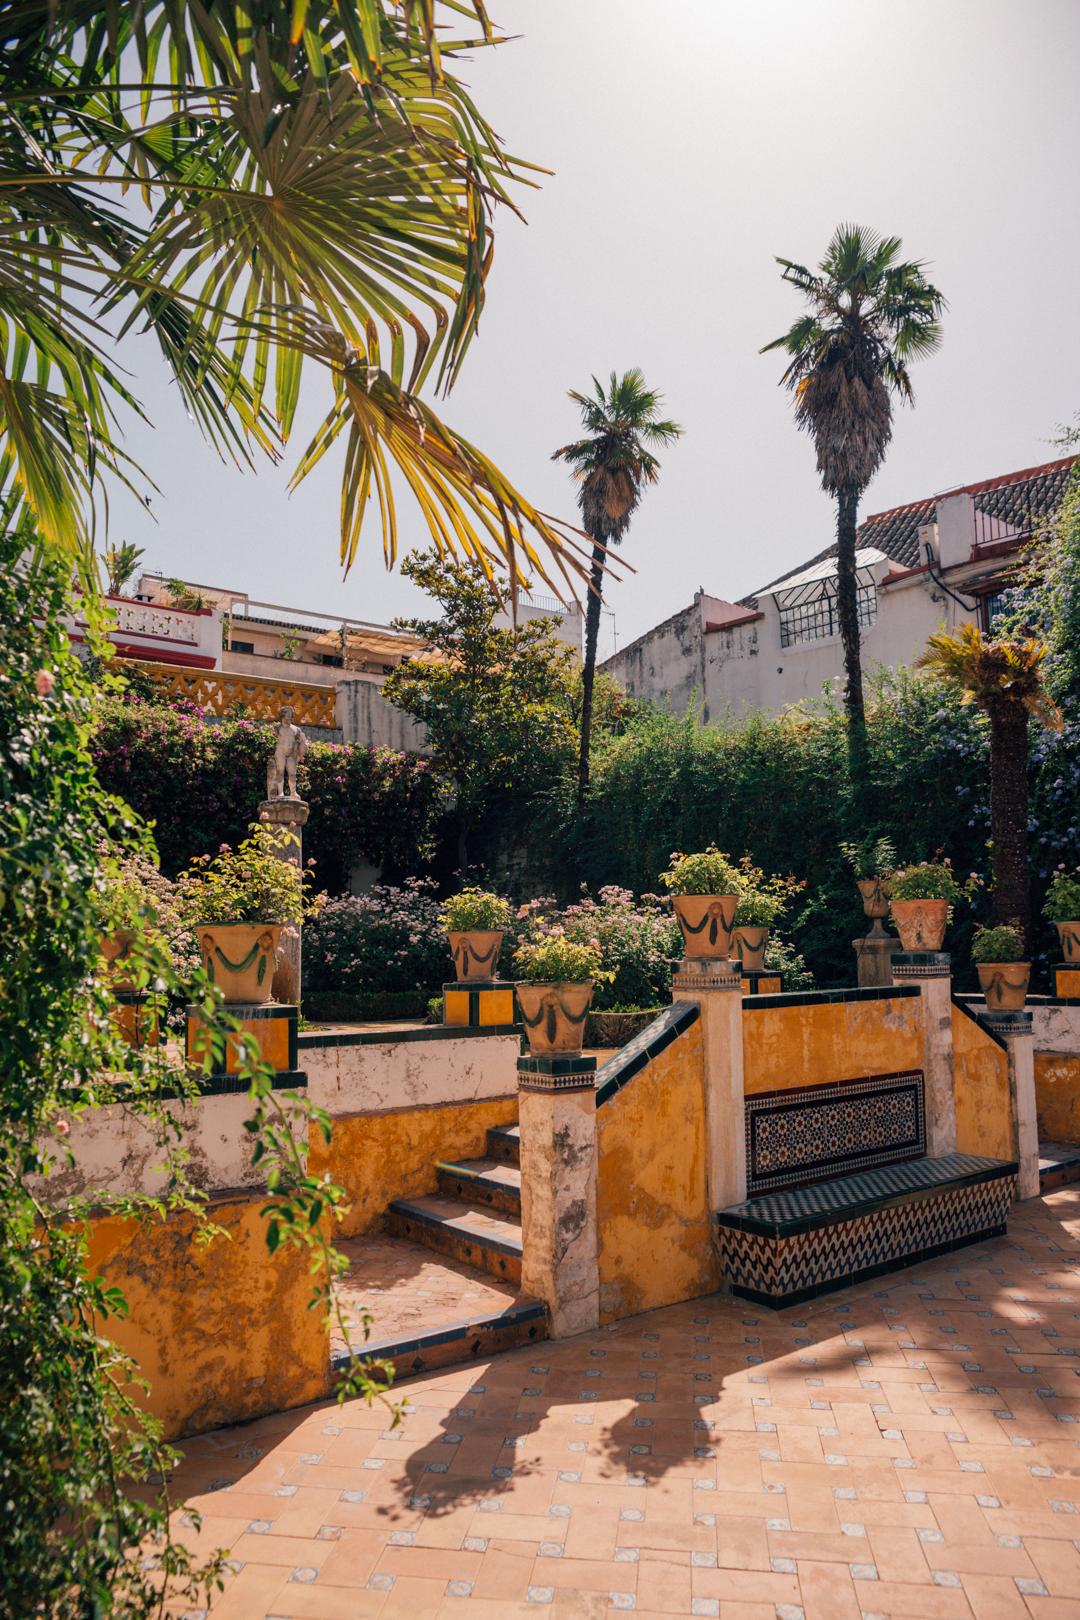 Casa de Pilatos in Seville, Spain